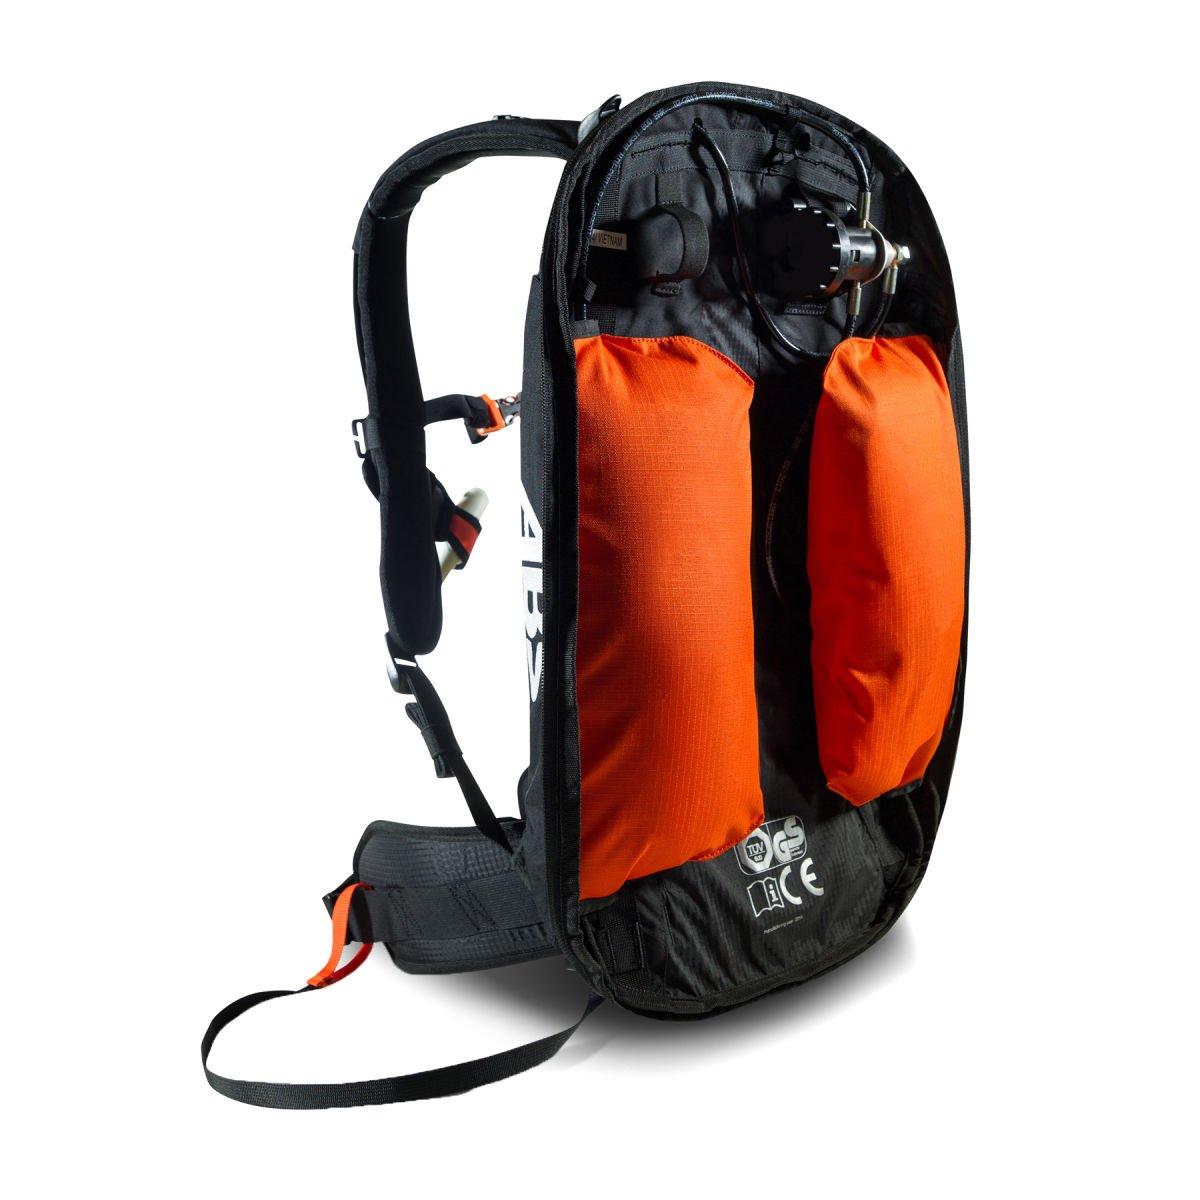 Рюкзак abs avalanche airbag sistem, объем 30 л рюкзак норт фейс